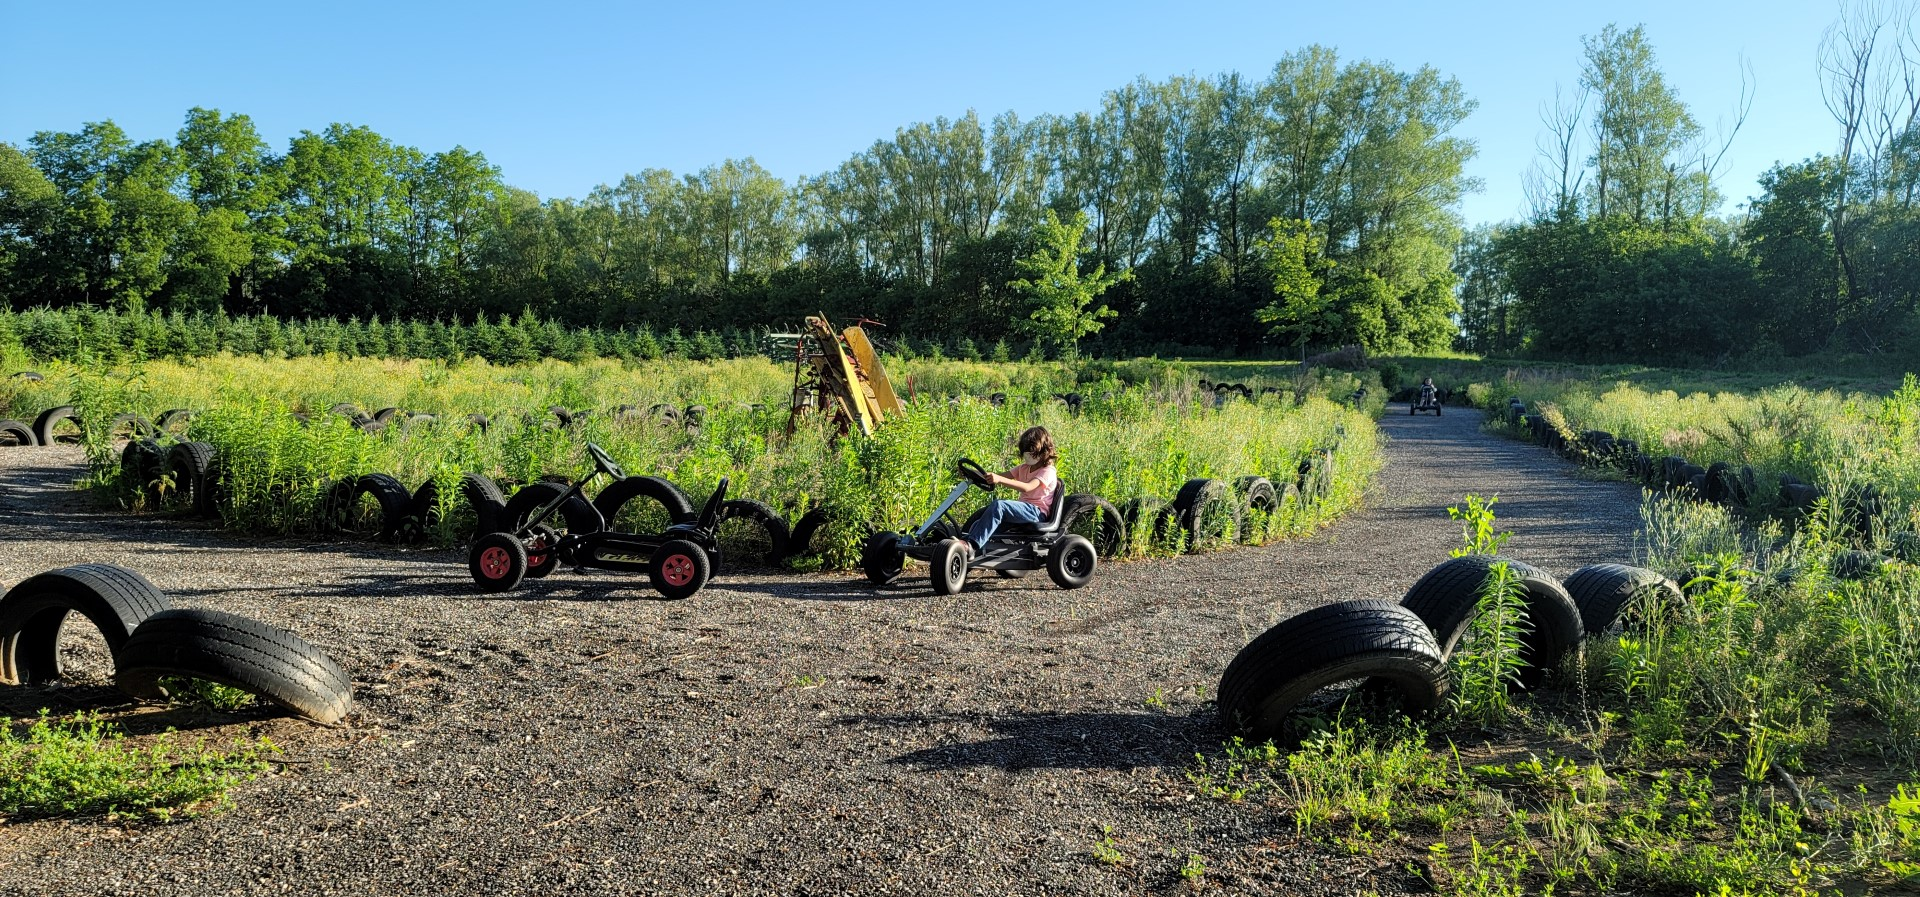 kid on go cart in Ontario